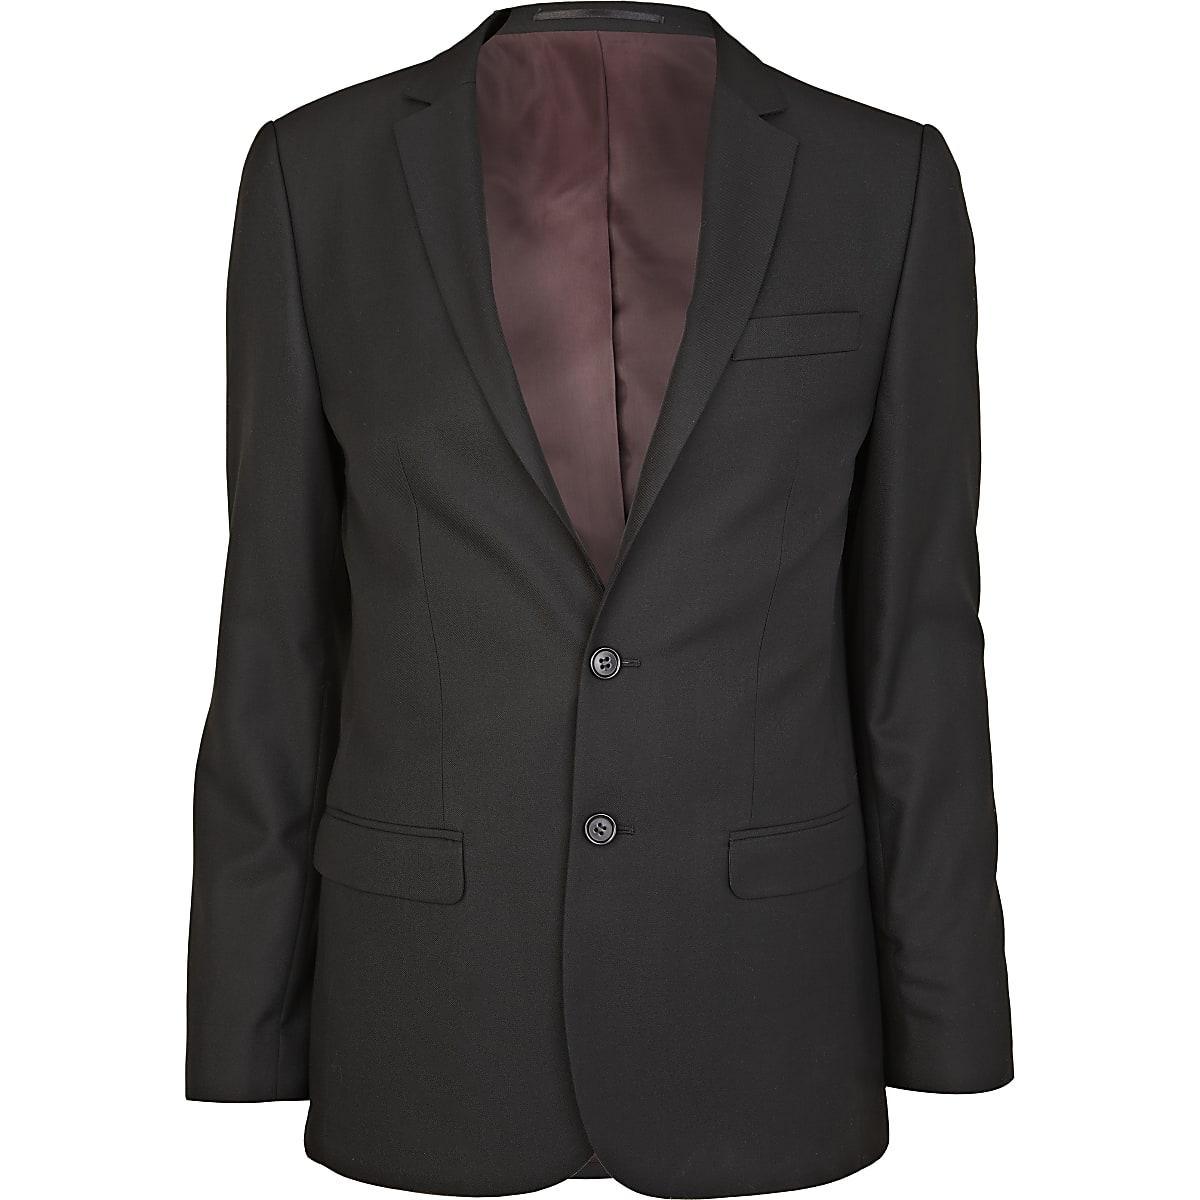 Veste de costume habillée tissée noire coupe skinny